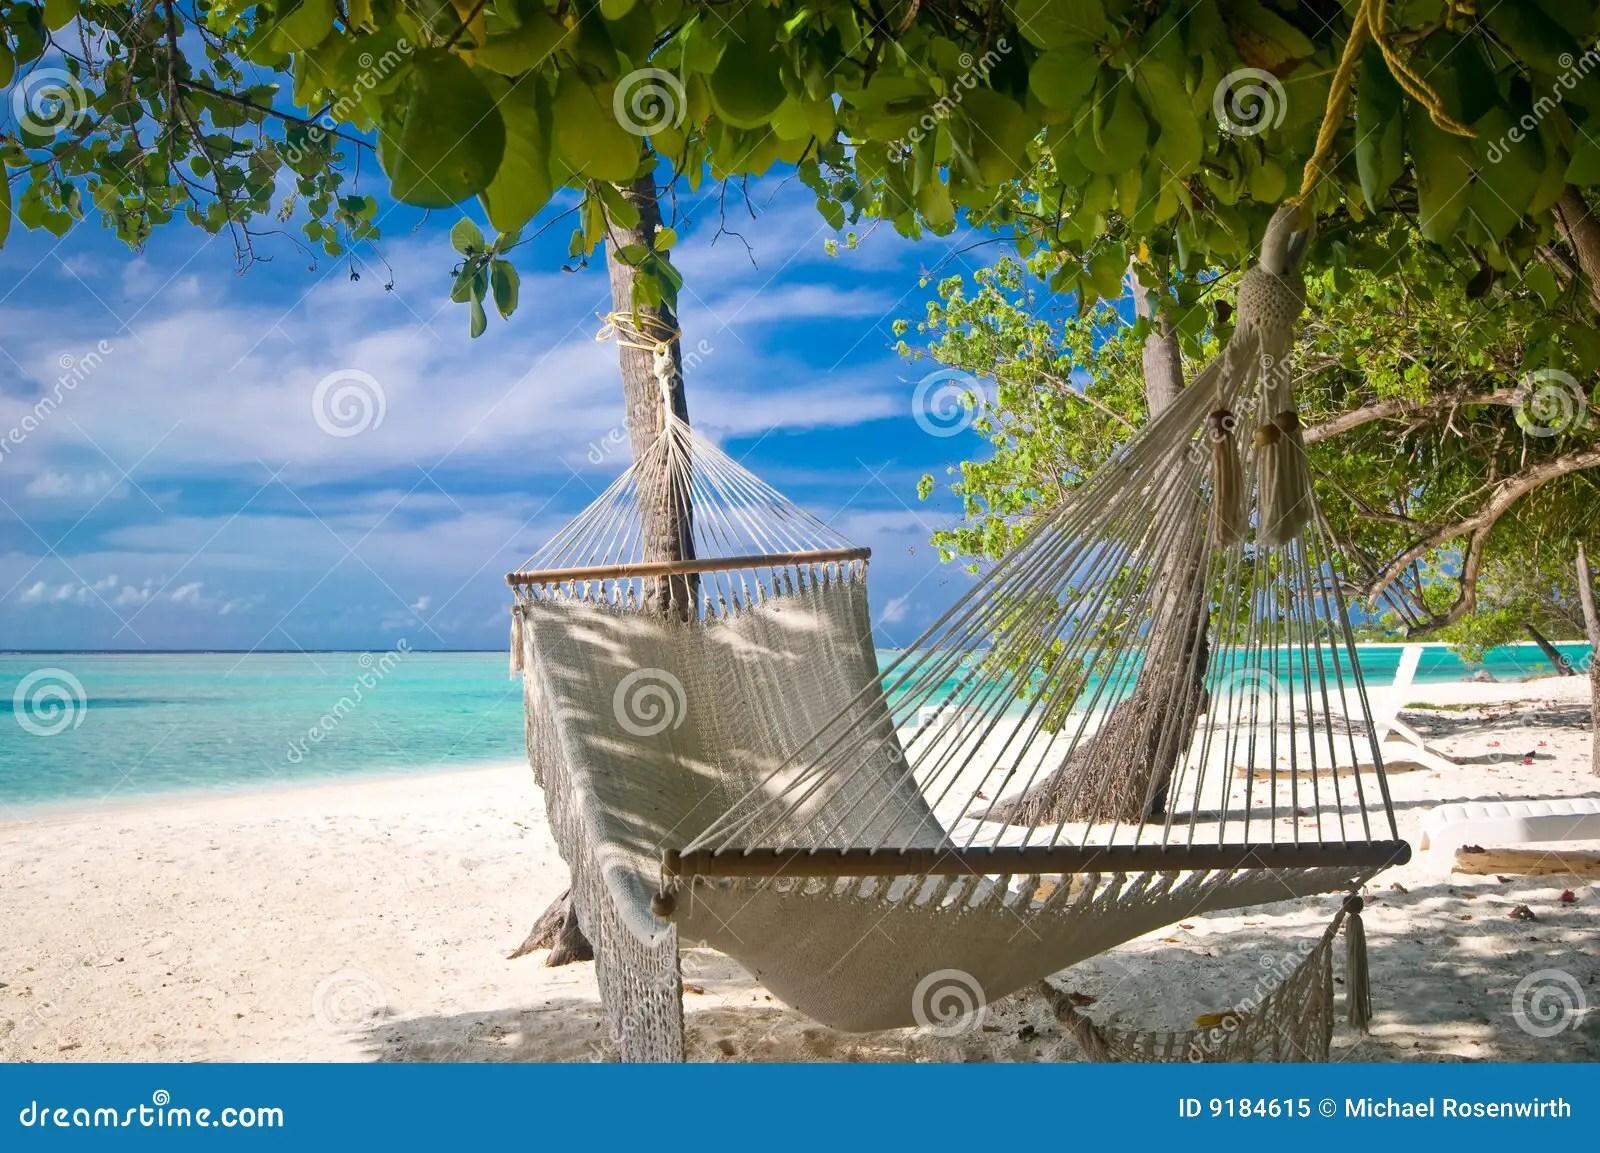 Hamaca De La Playa Imagen De Archivo Imagen De Hamaca